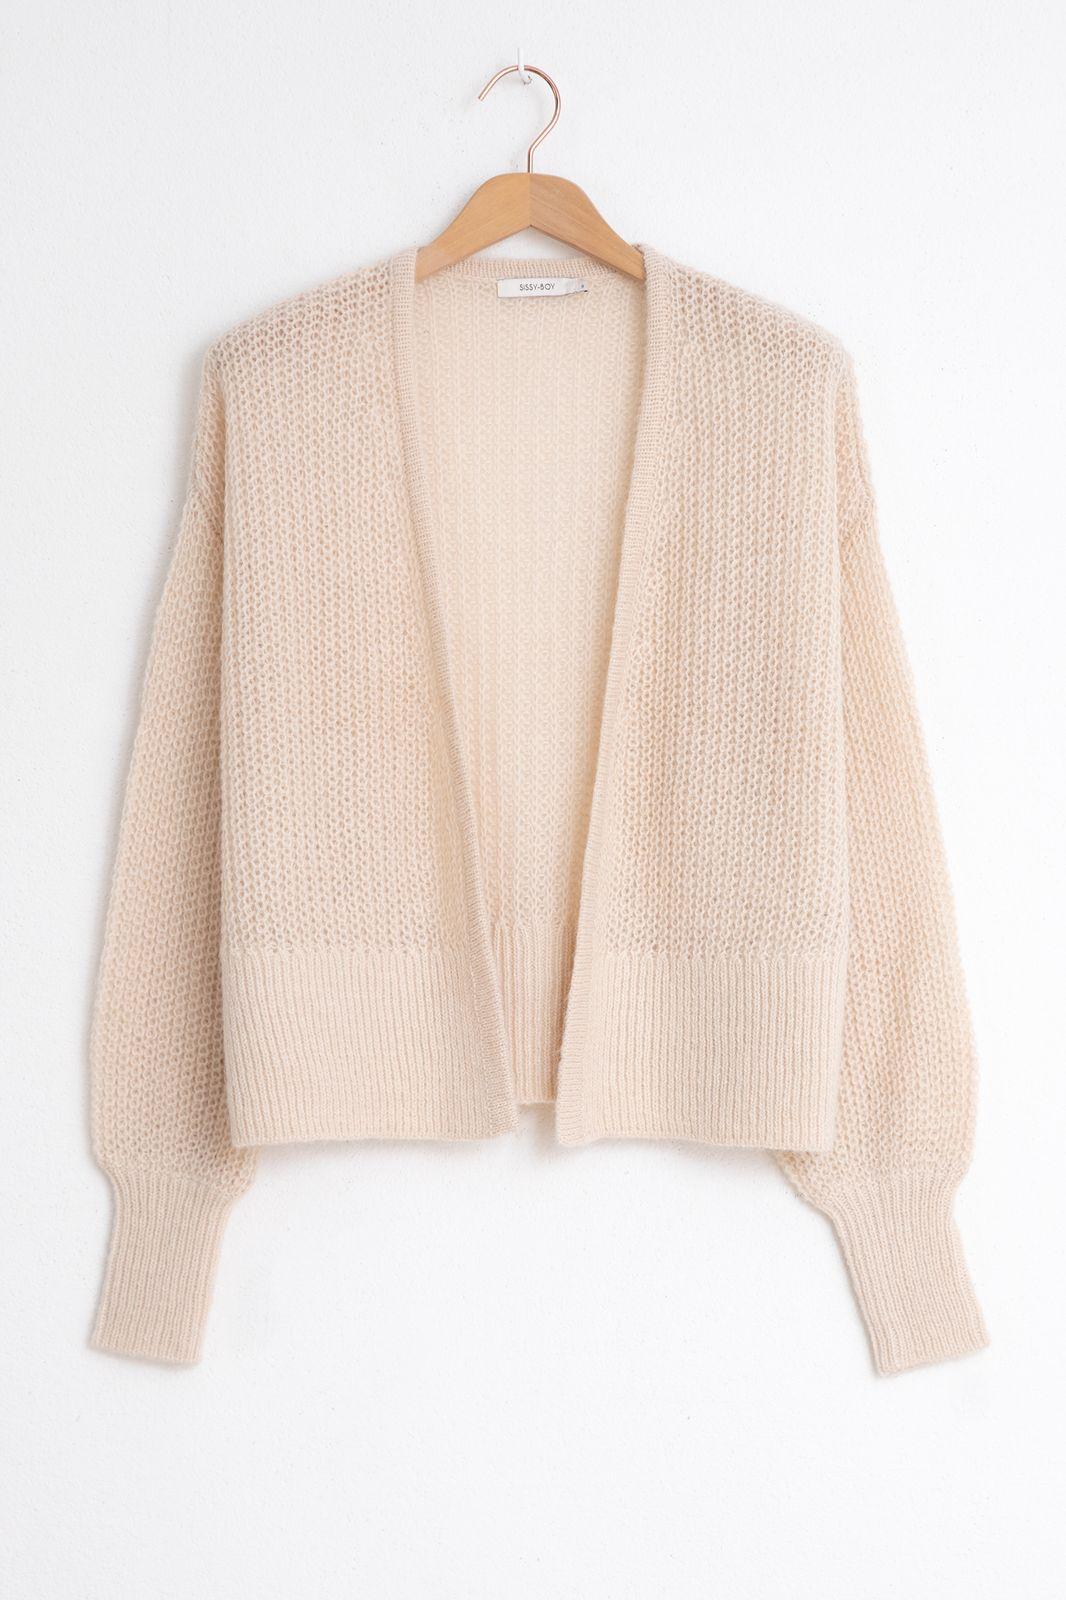 Offwhite vest